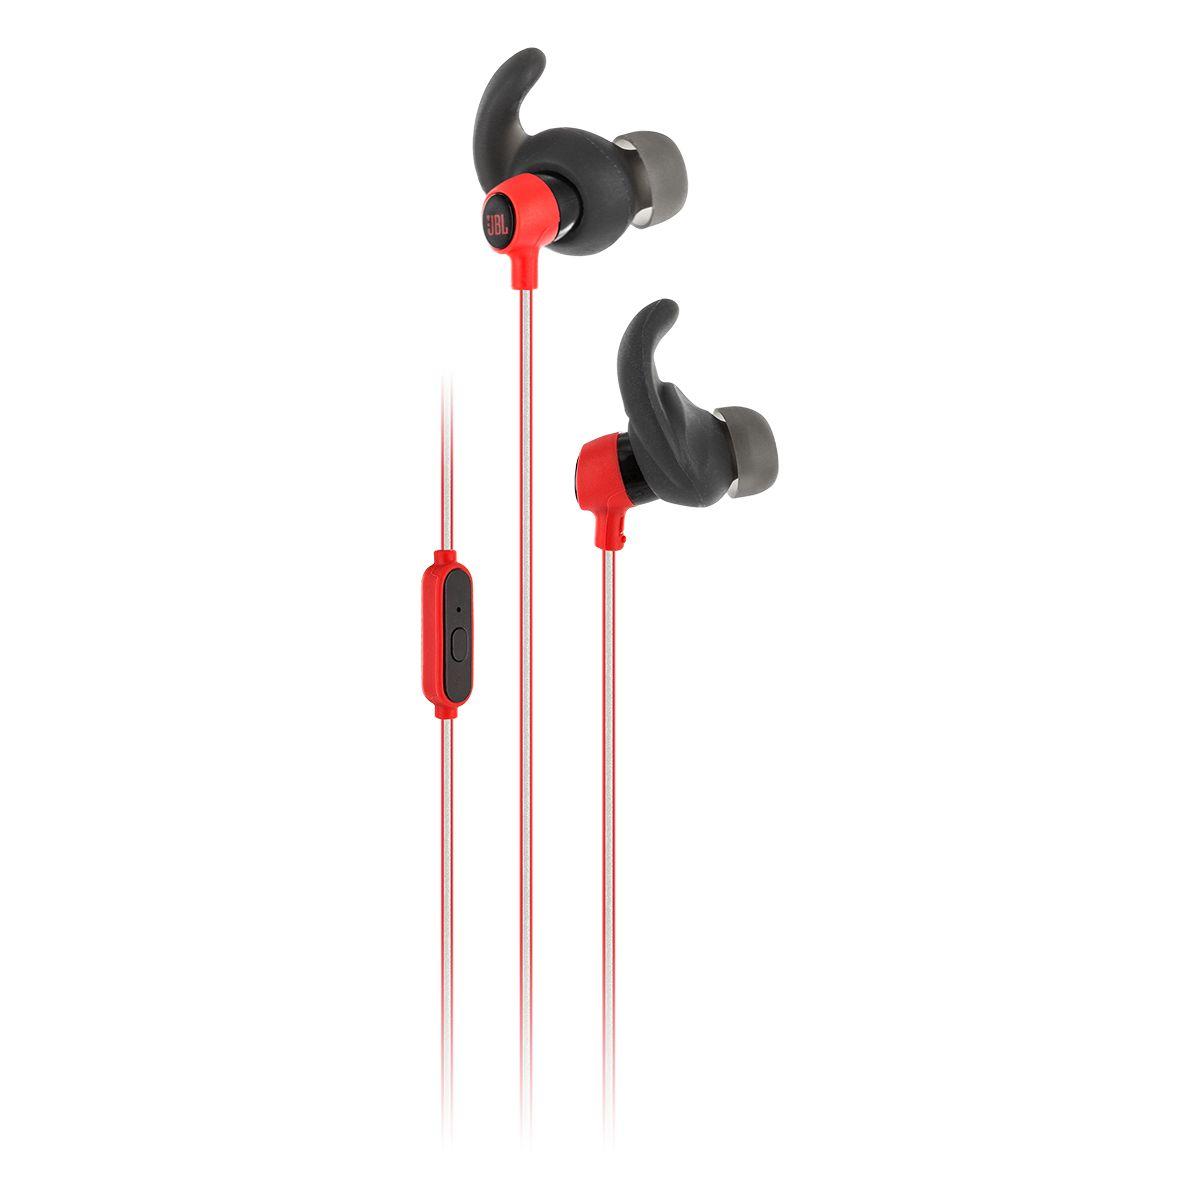 Ecouteurs sport JBL Reflect mini rouge